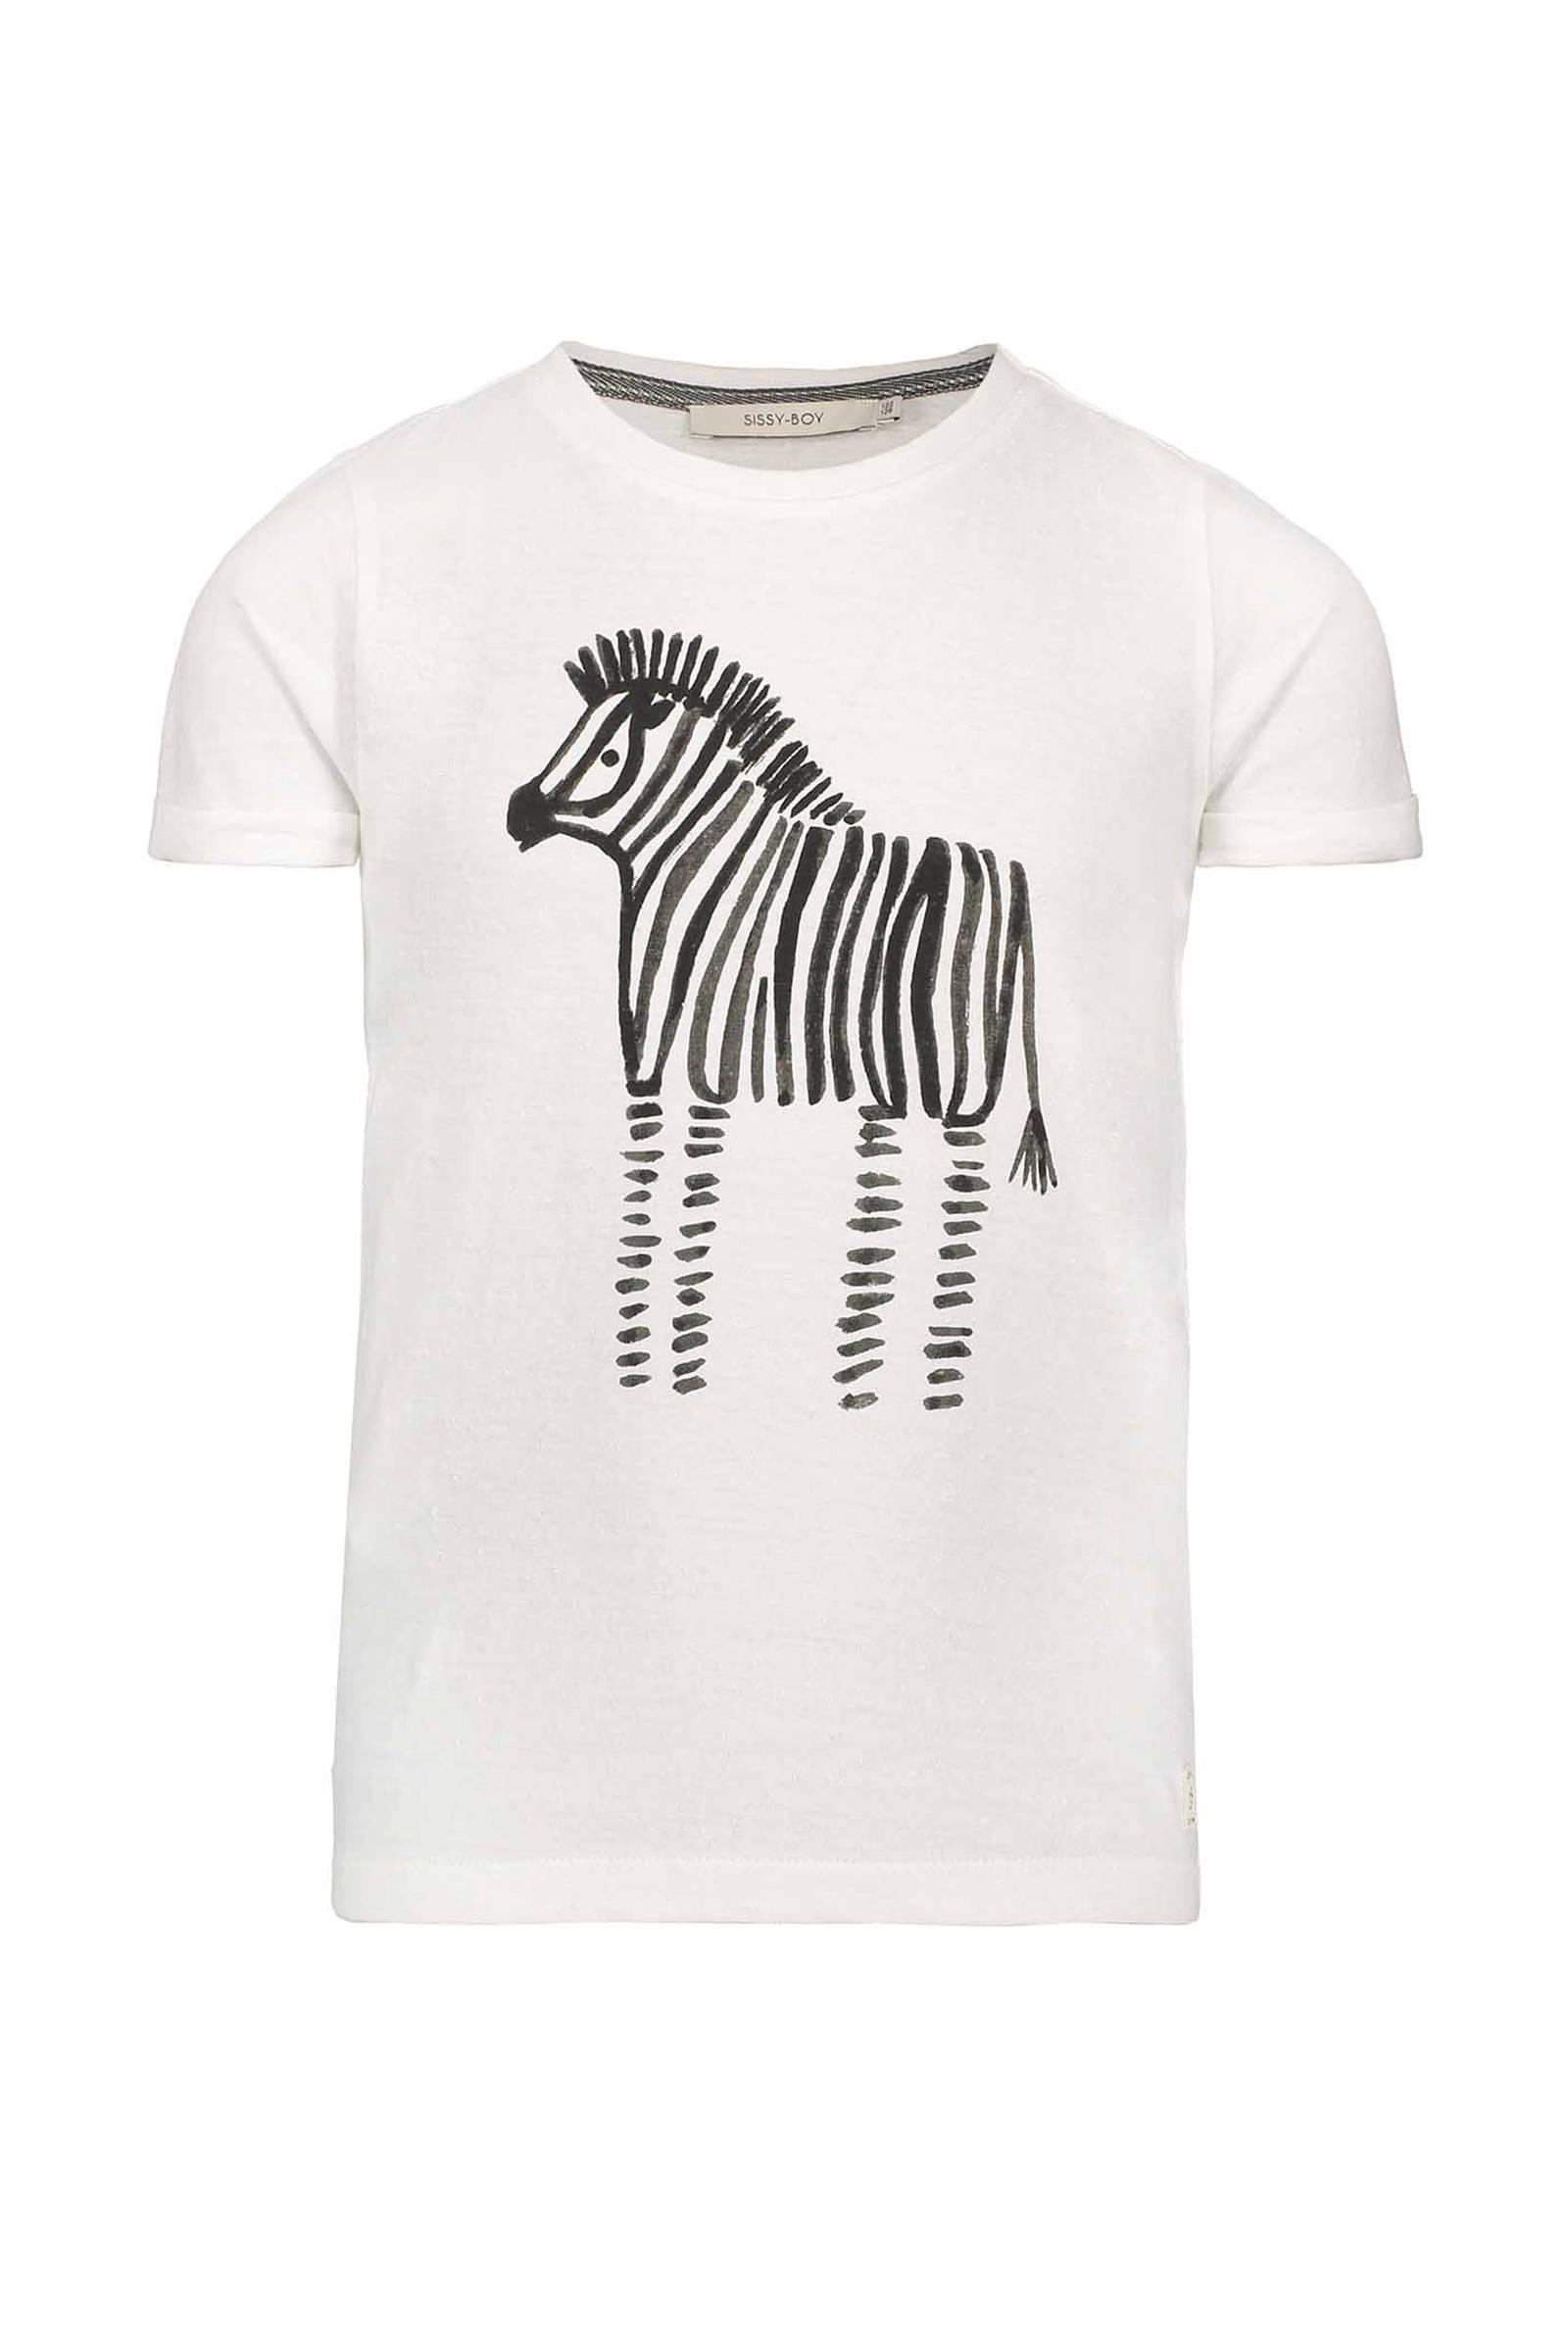 Sissy Boy T shirt   wehkamp